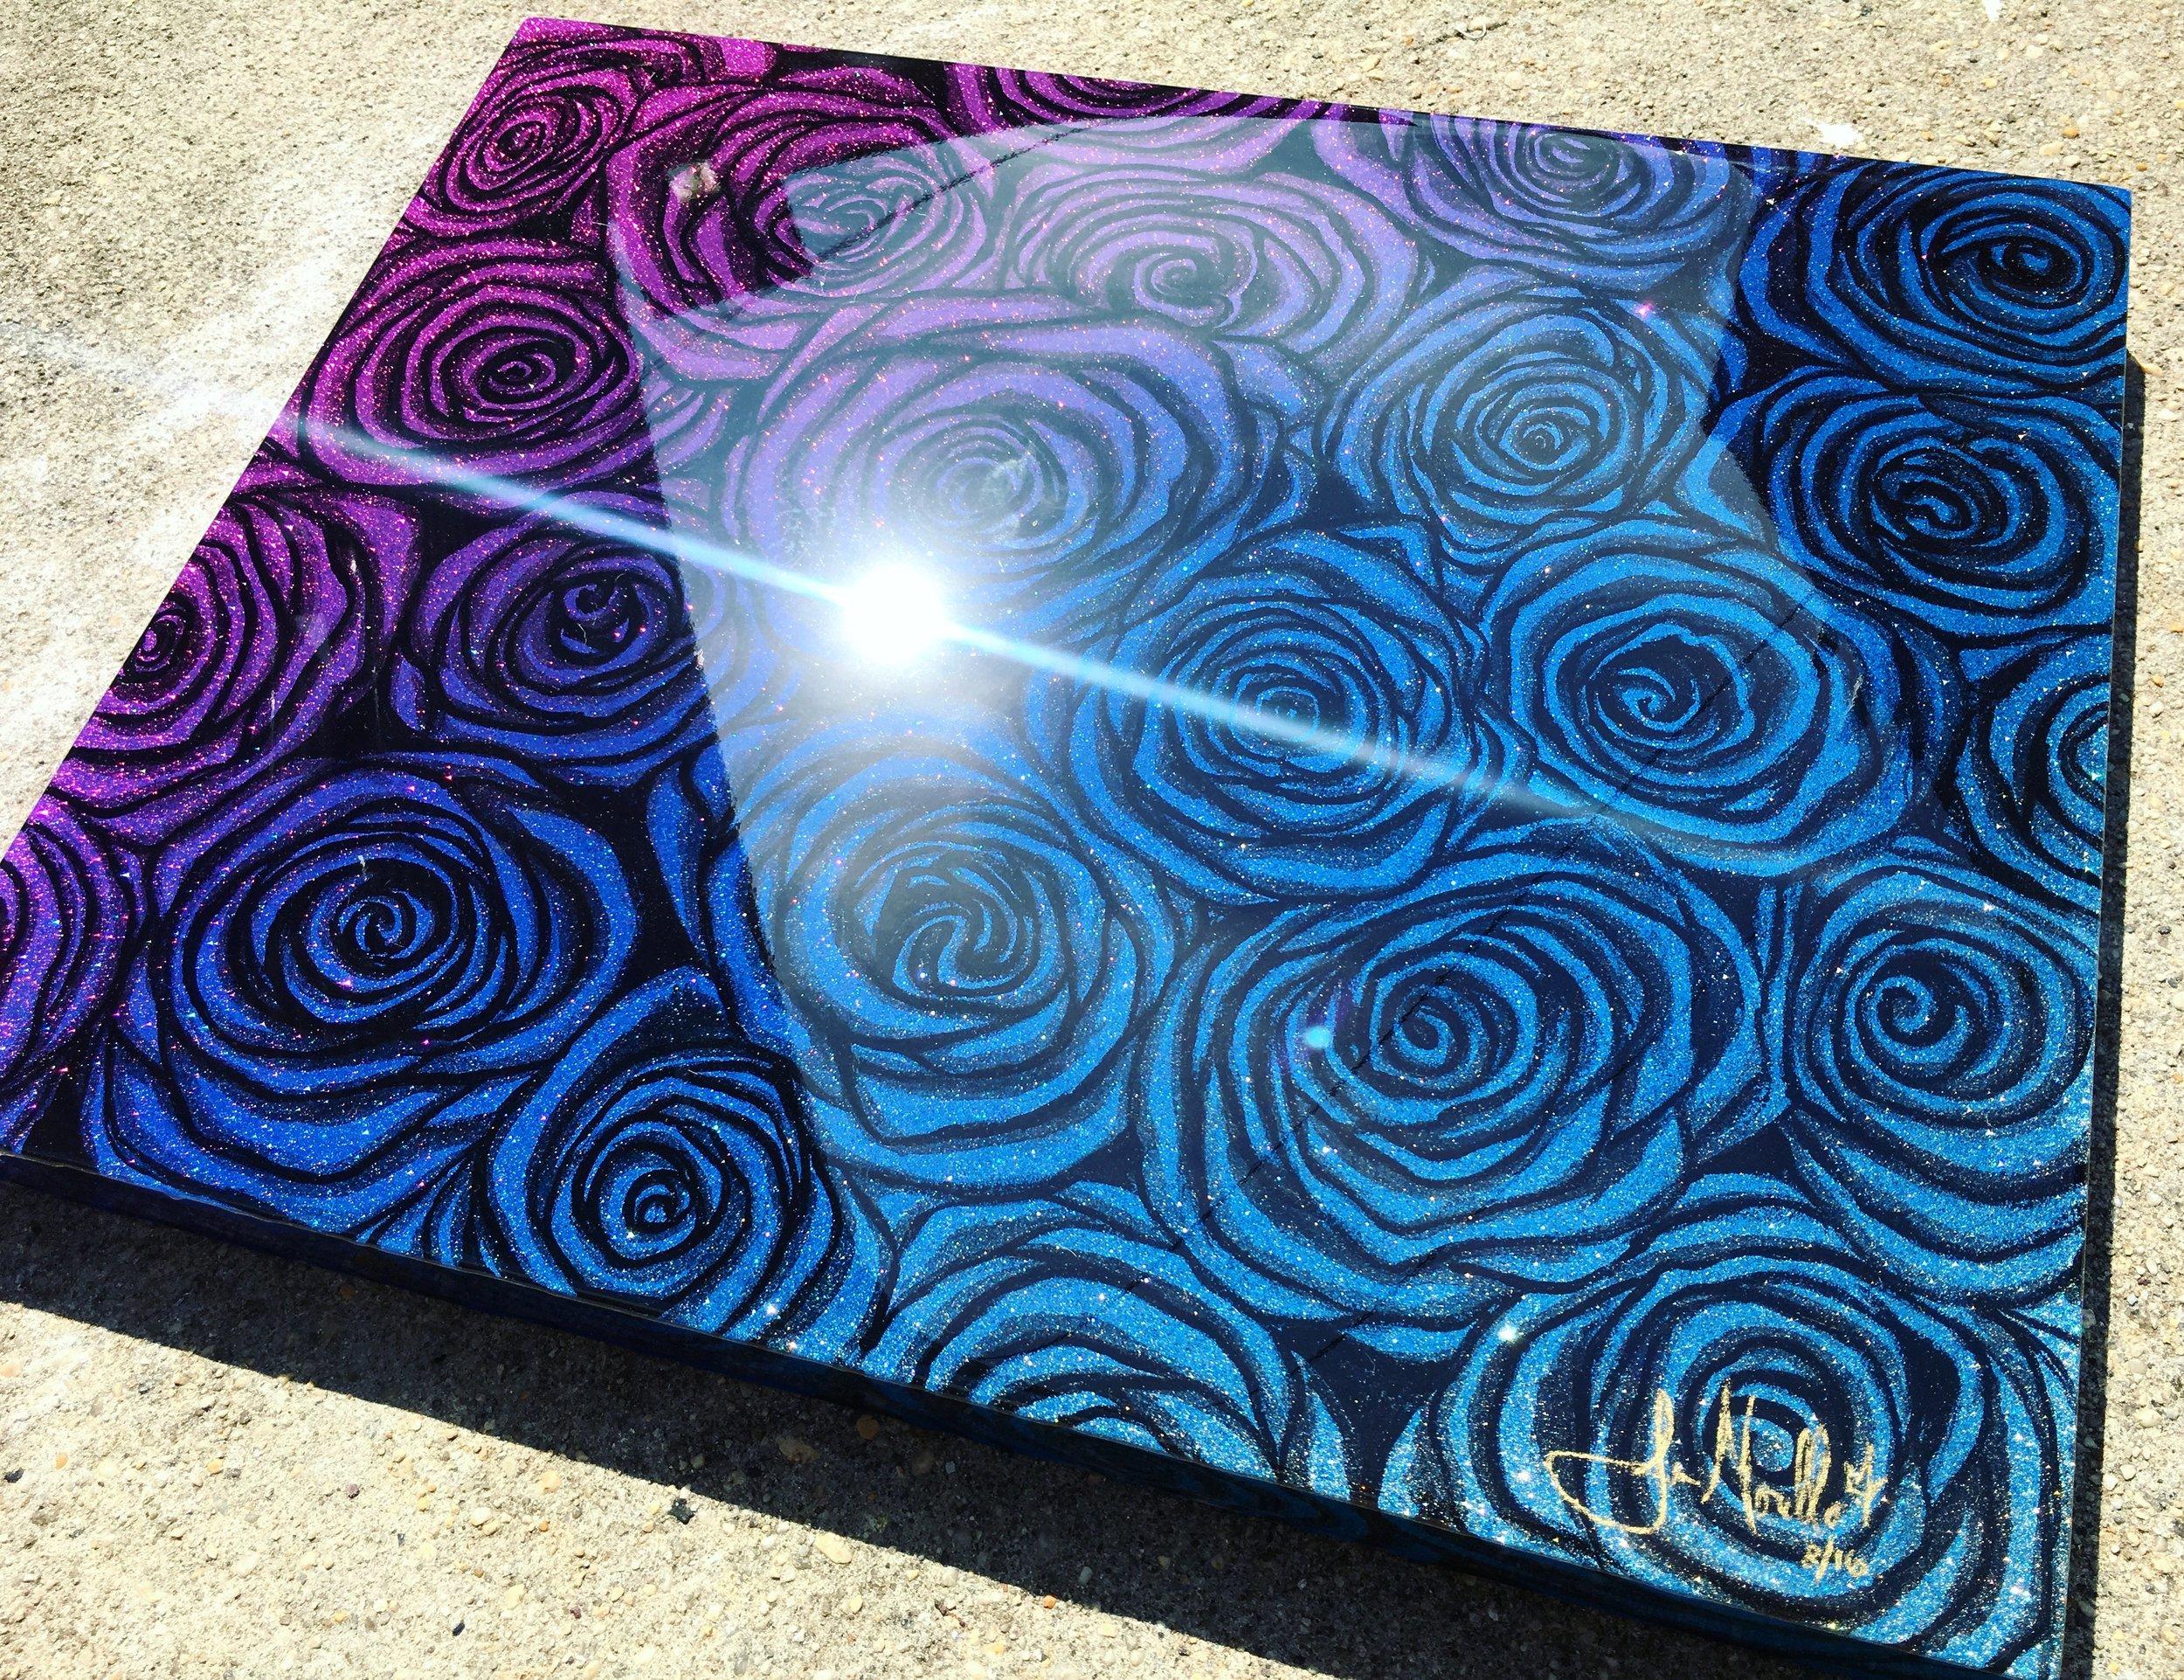 Aerosol, acrylic, and resin on hardboard